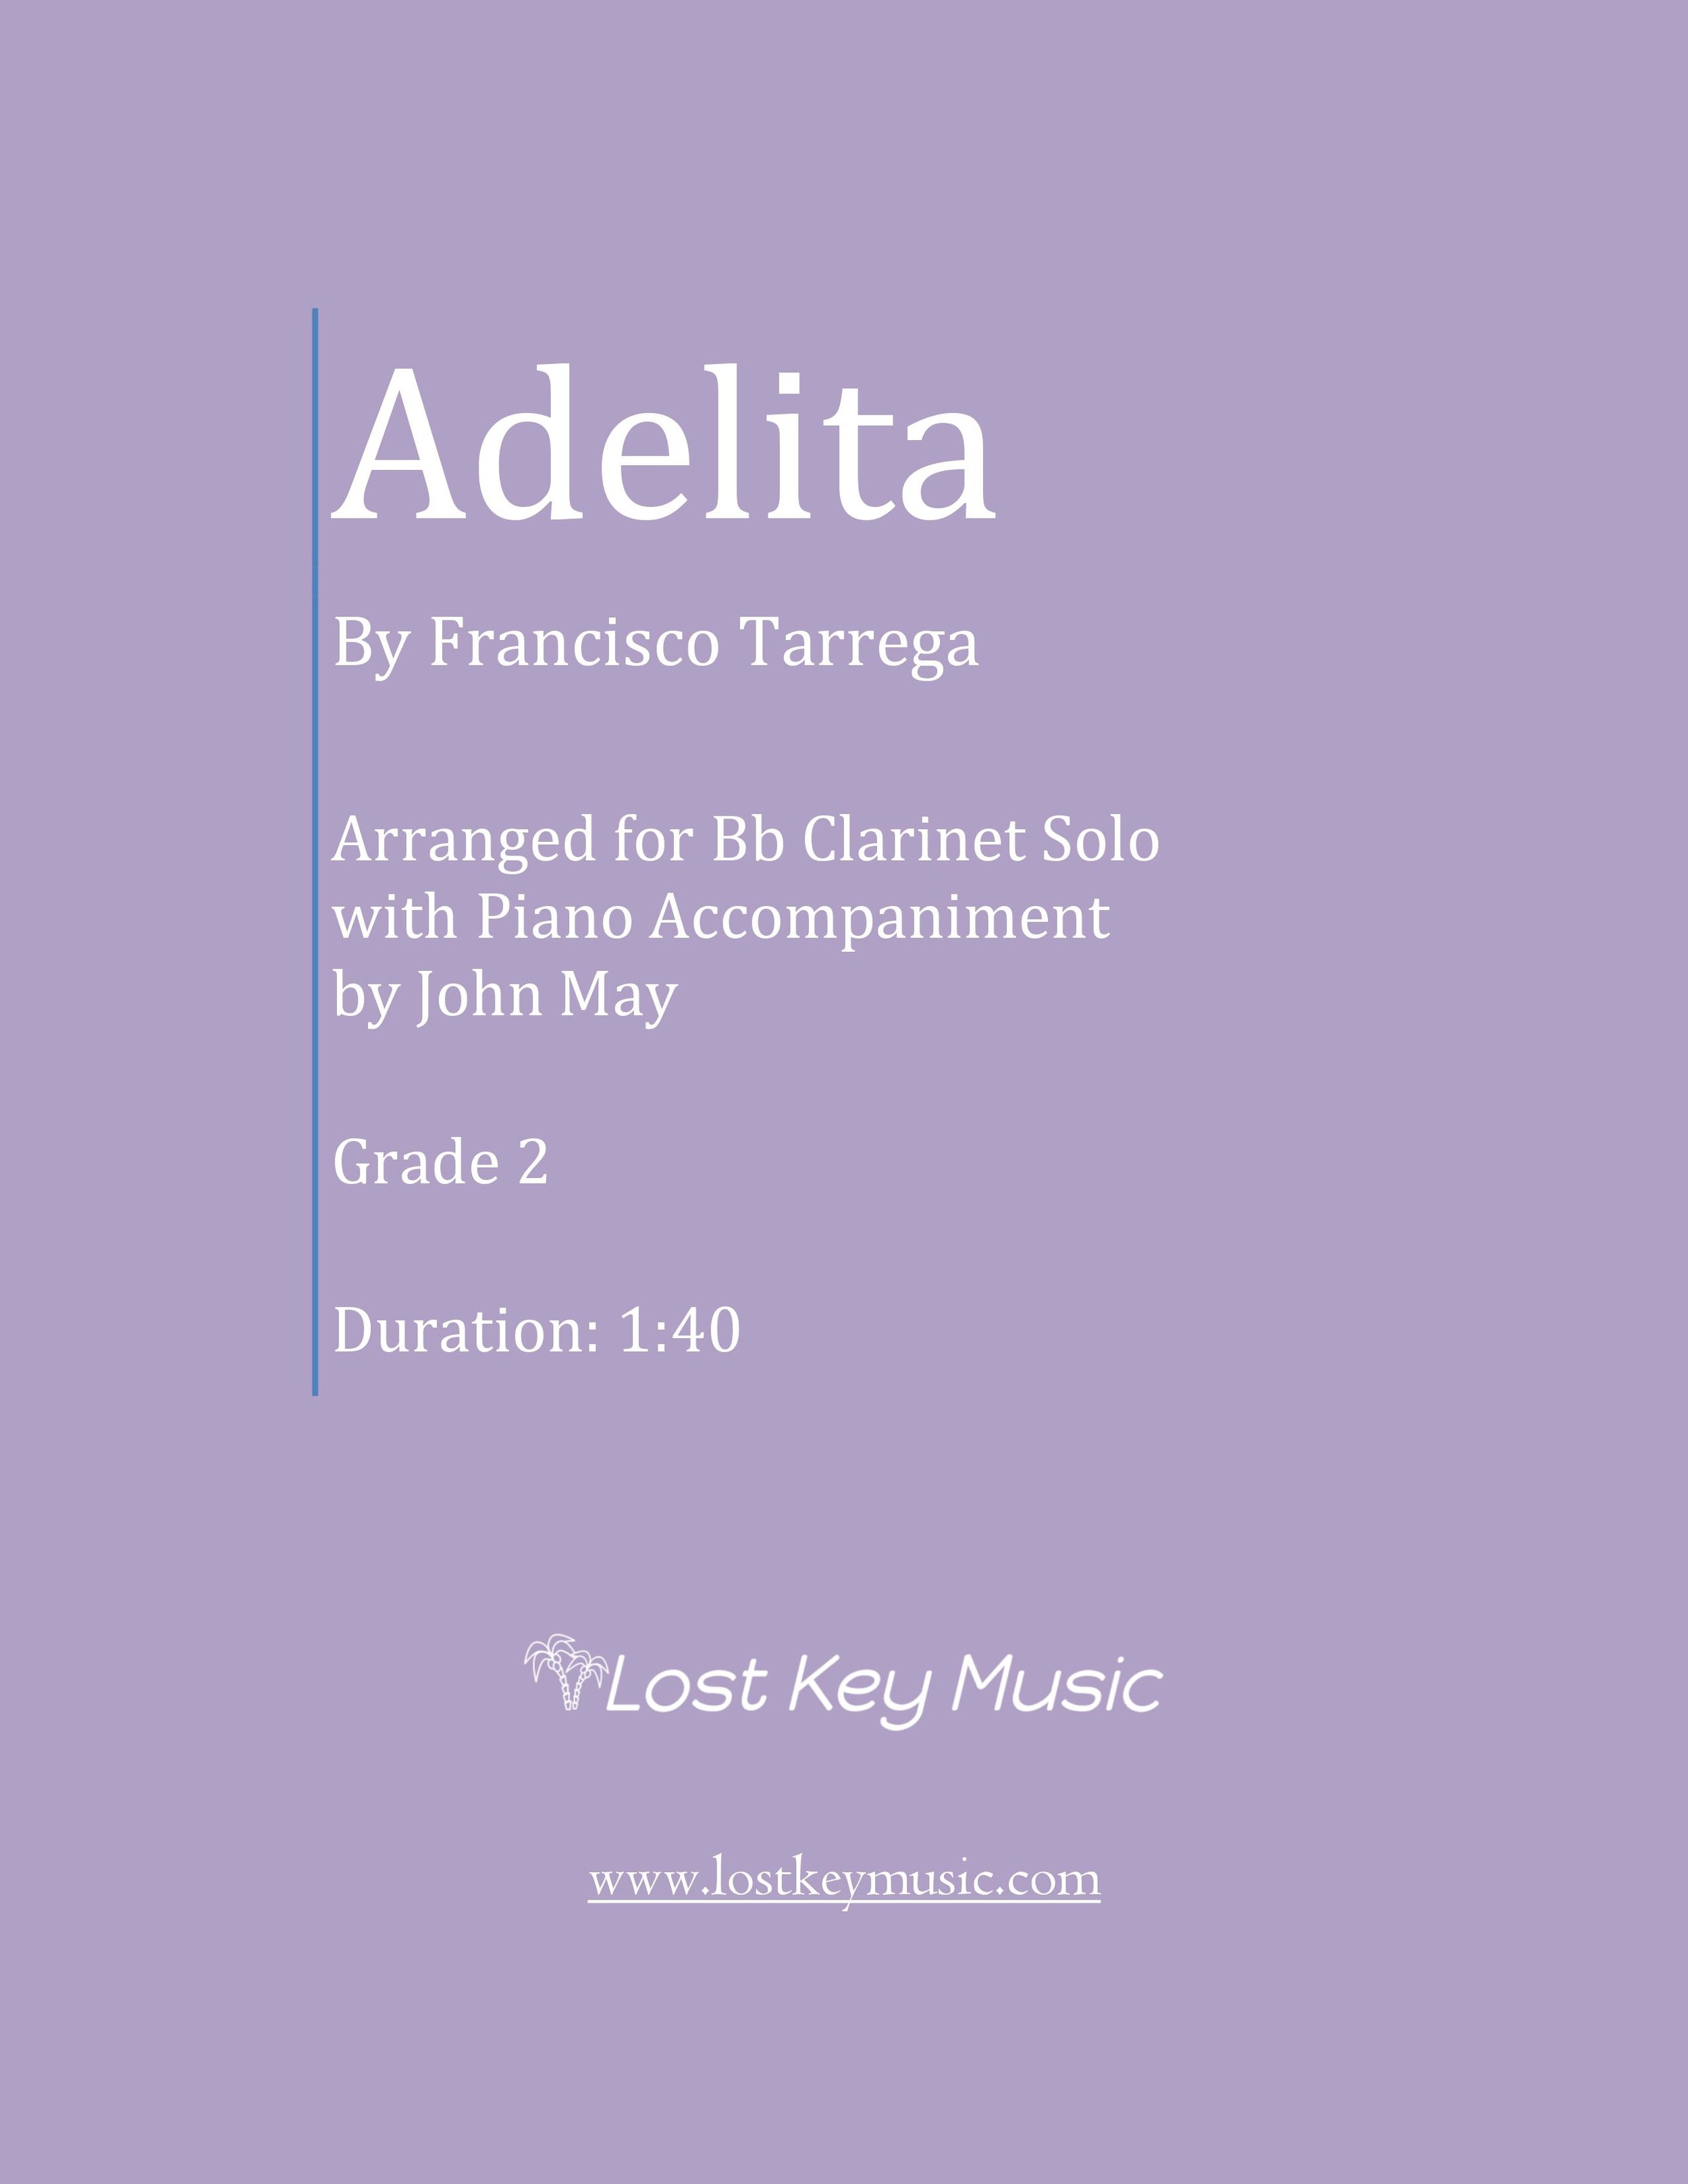 Adelita-Bb Clarinet Solo with Piano Accompaniment-Cover Photo.jpg